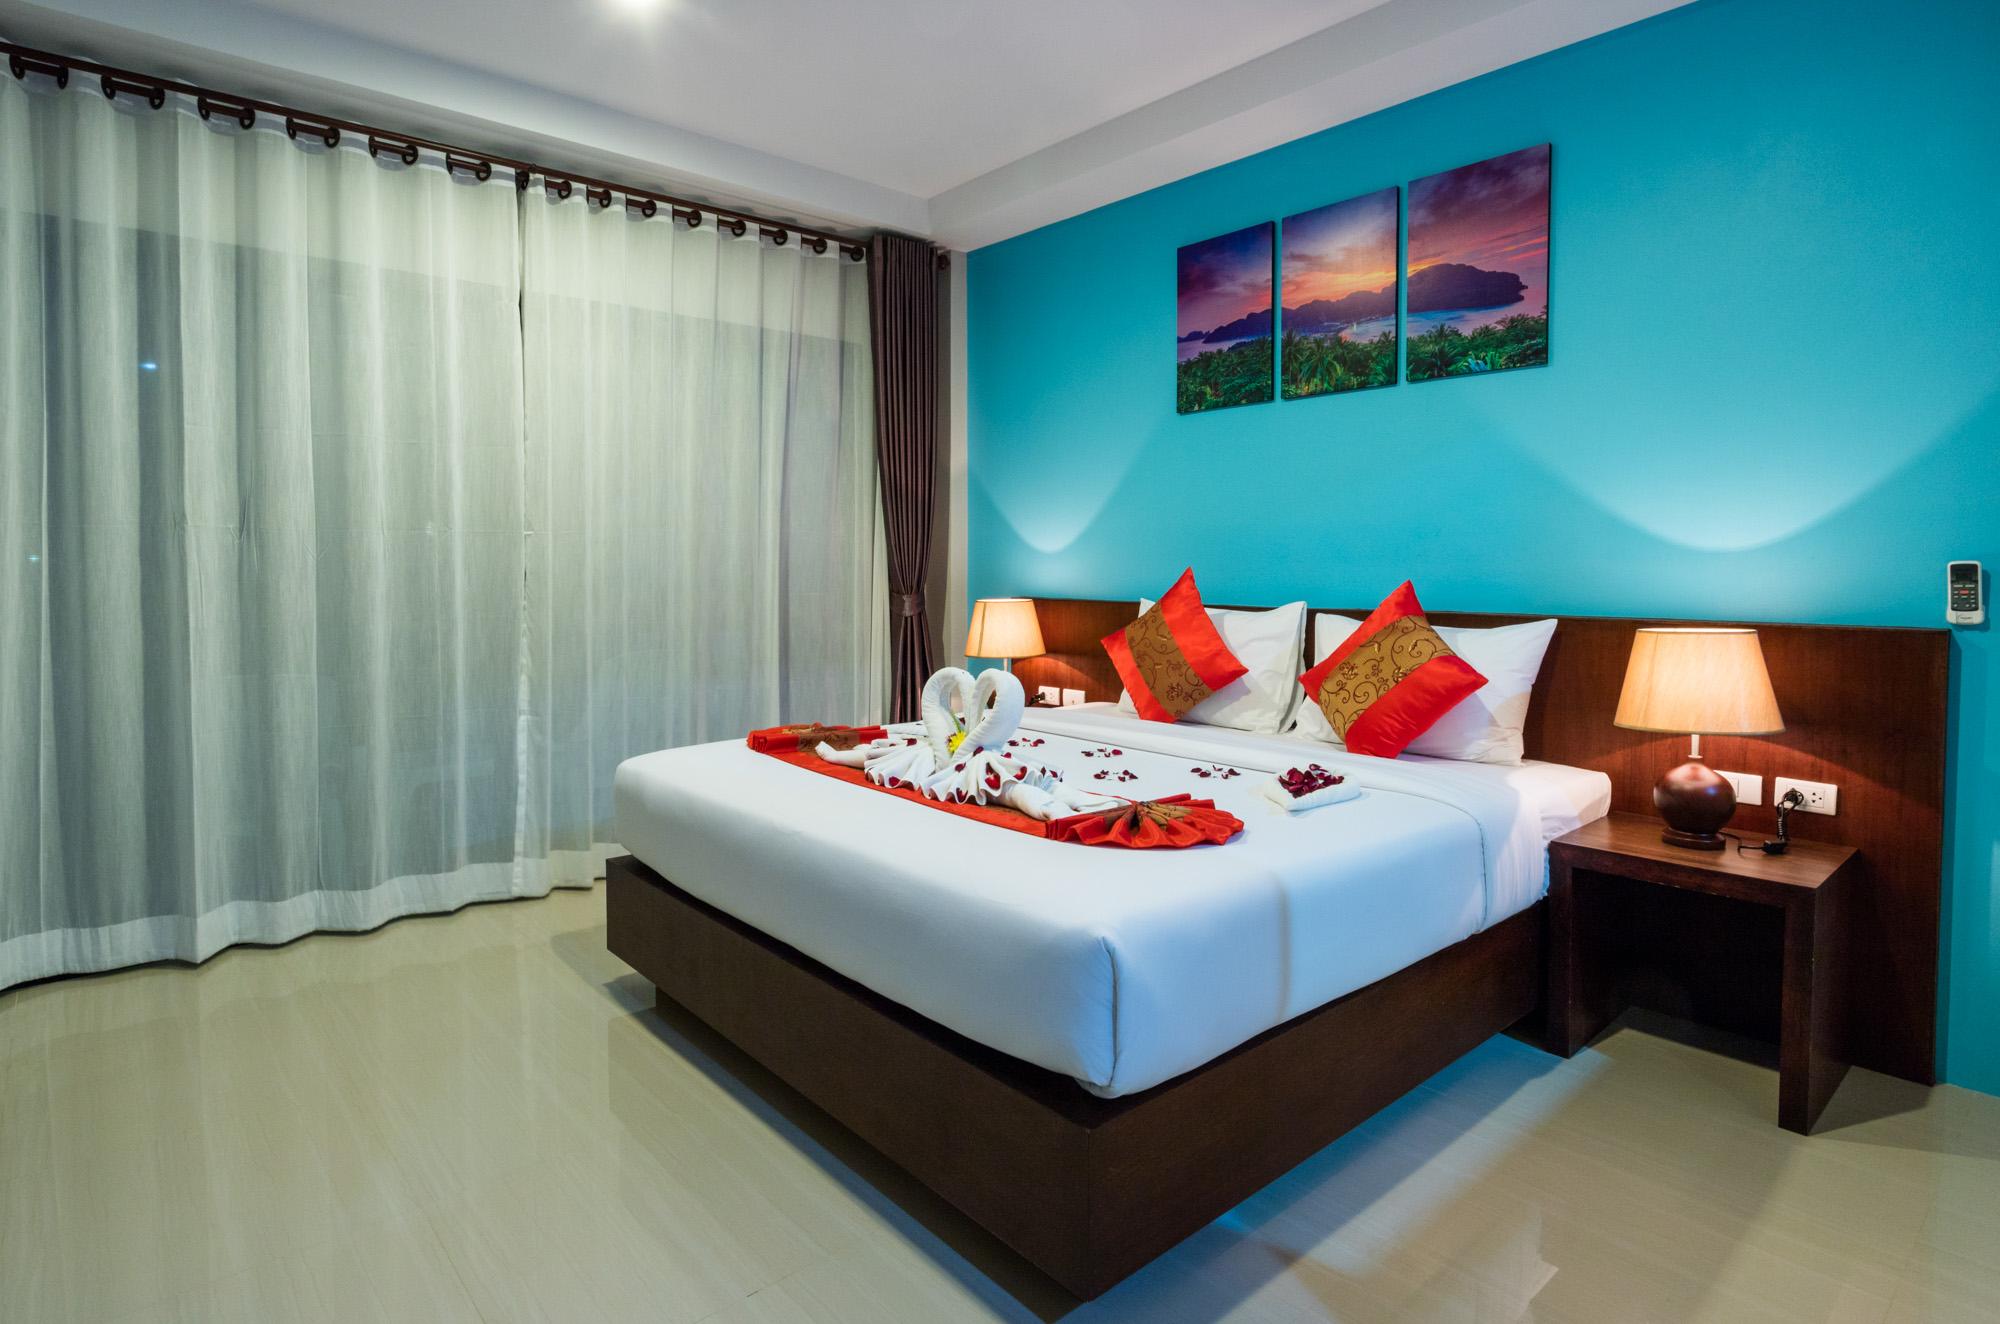 Andaman Pearl Resort อันดามัน เพิร์ล รีสอร์ต โรงแรมฮาลาล กระบี่  อันดามันเพิร์ล รีสอร์ท Andaman Pearl Resort Aonang IMG 5513